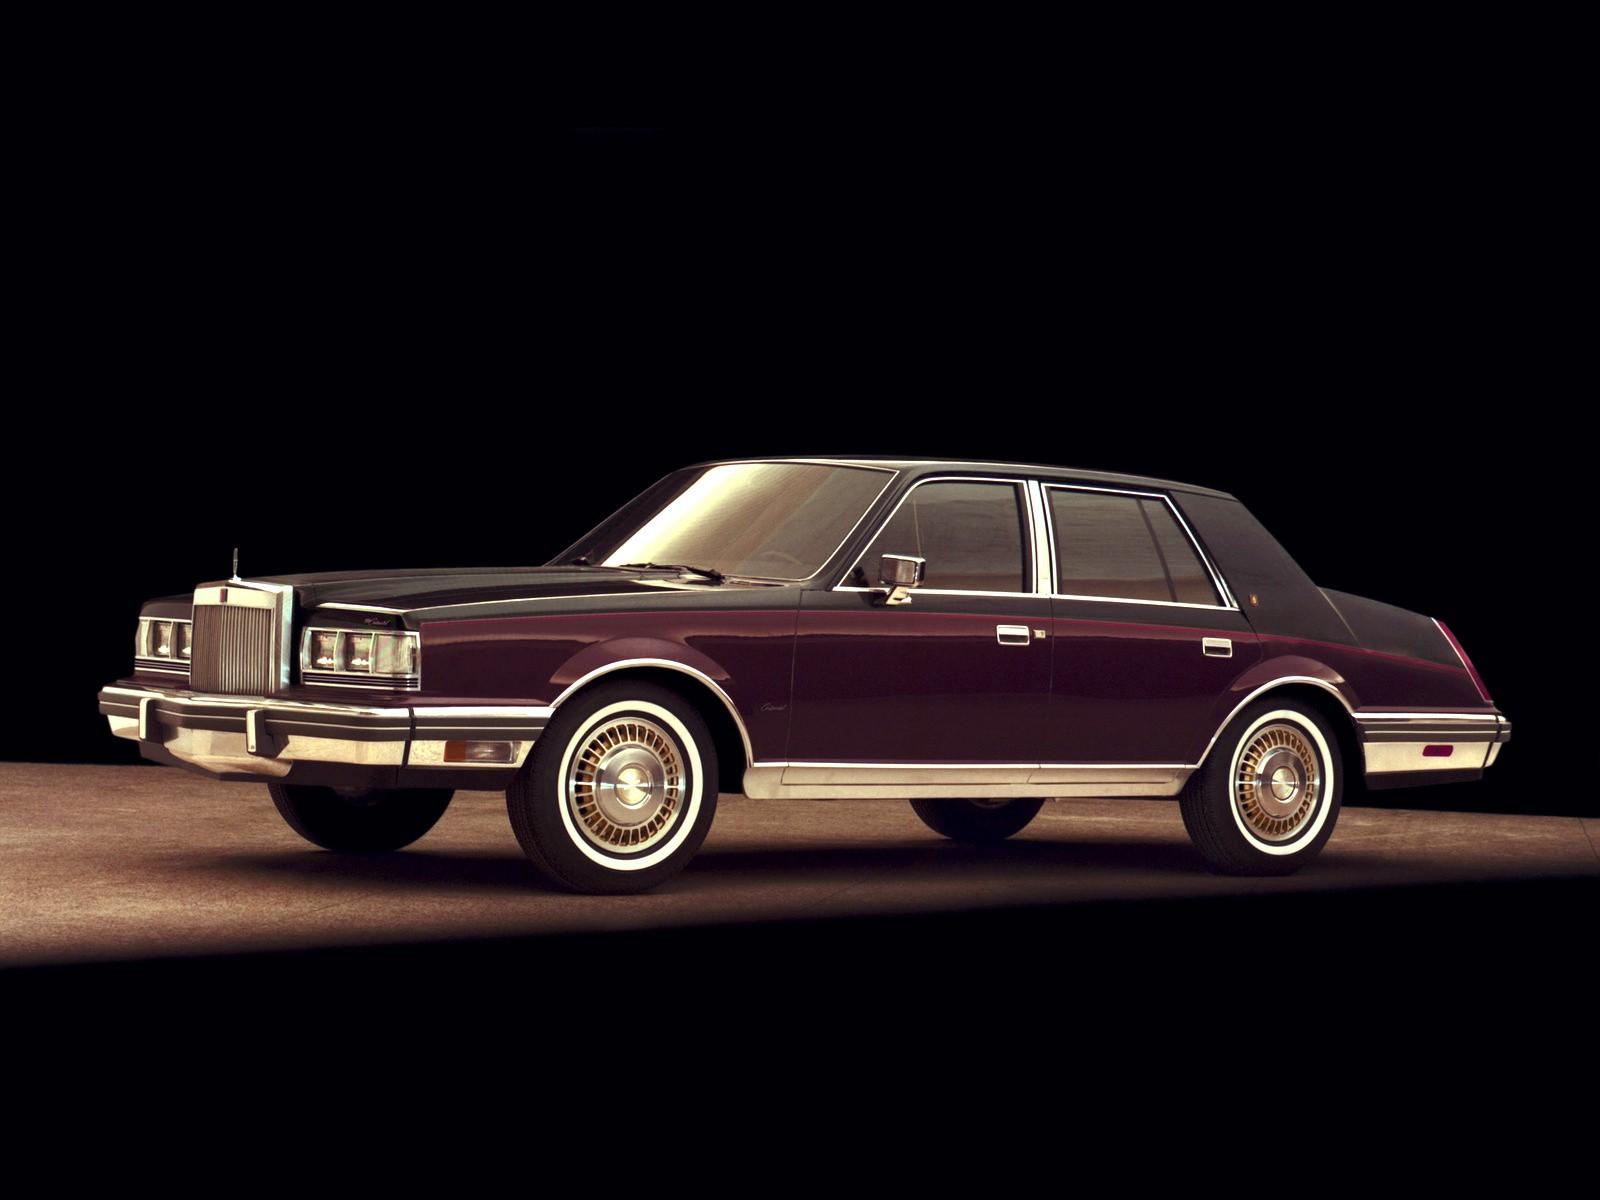 LINCOLN Continental specs & photos - 1982, 1983, 1984, 1985, 1986, 1987, 1988, 1989, 1990, 1991 ...